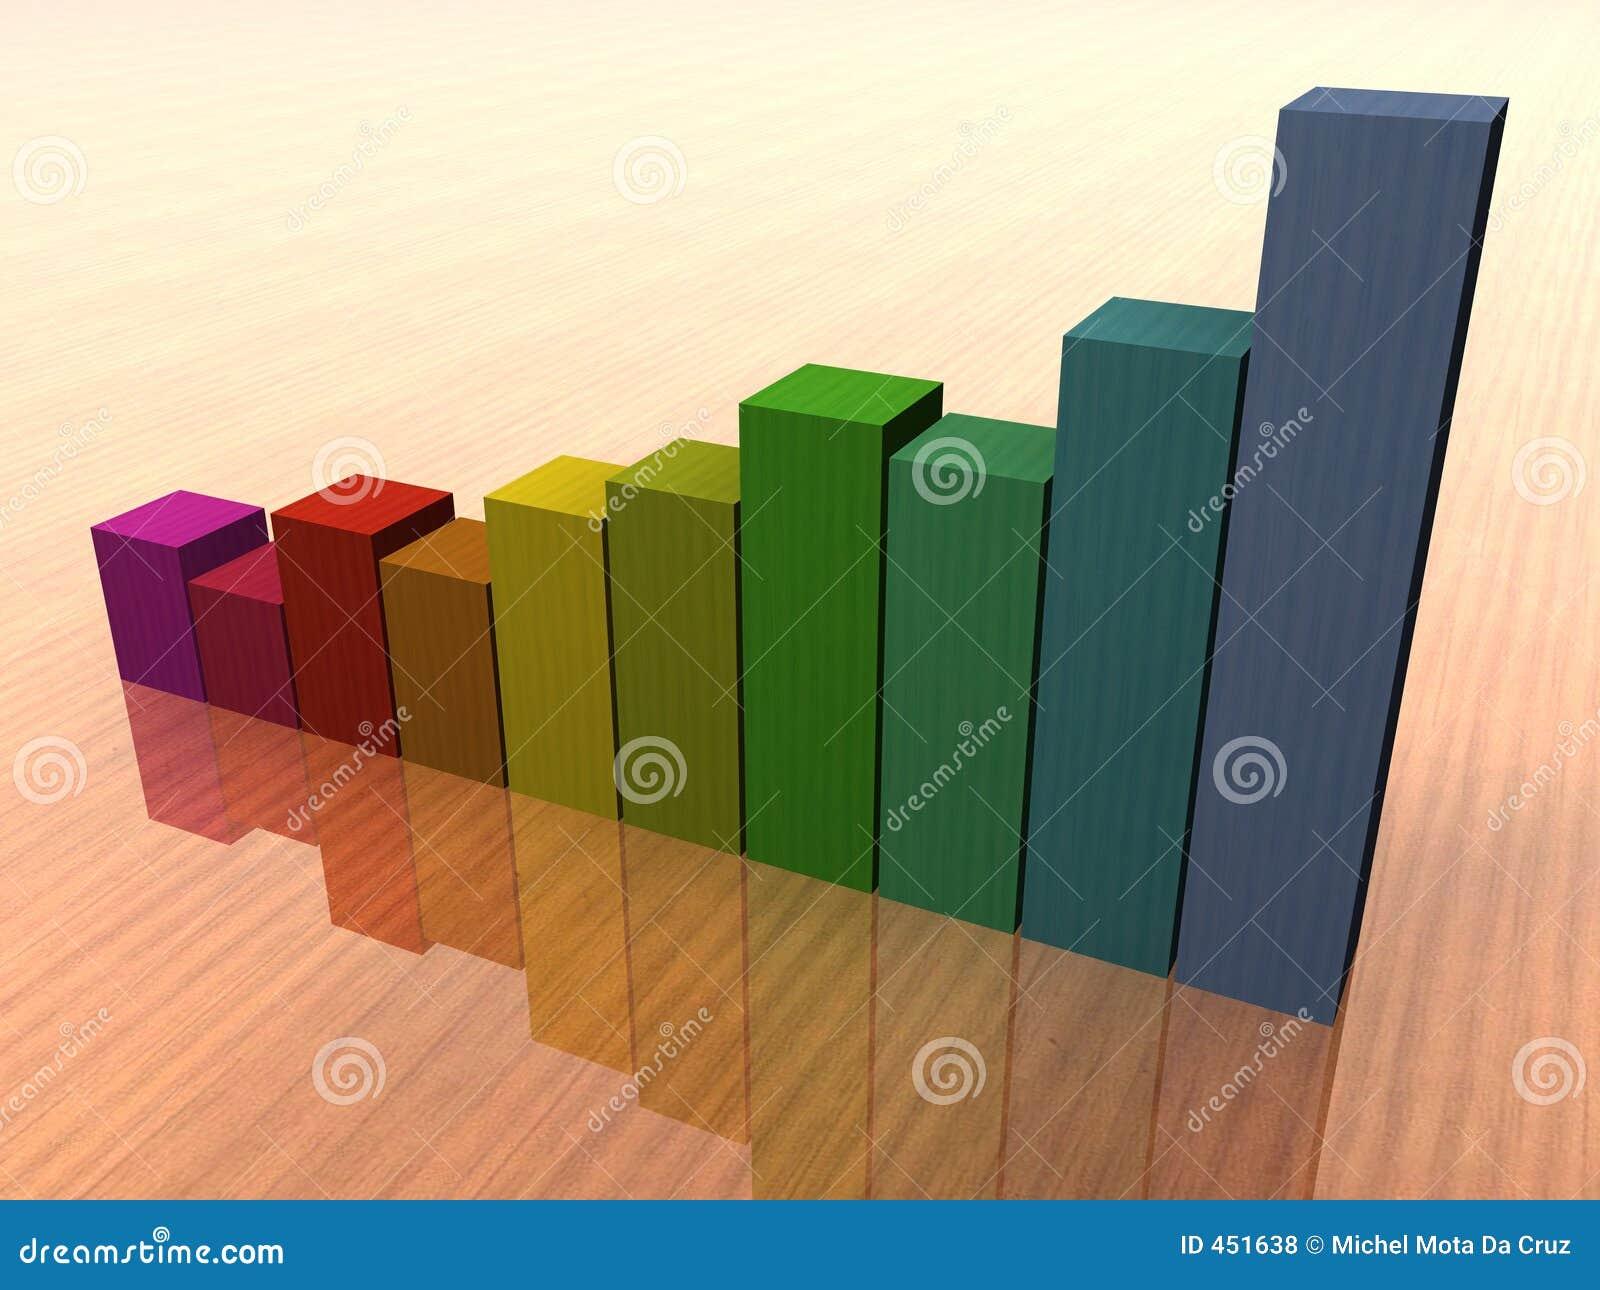 Statistics in color